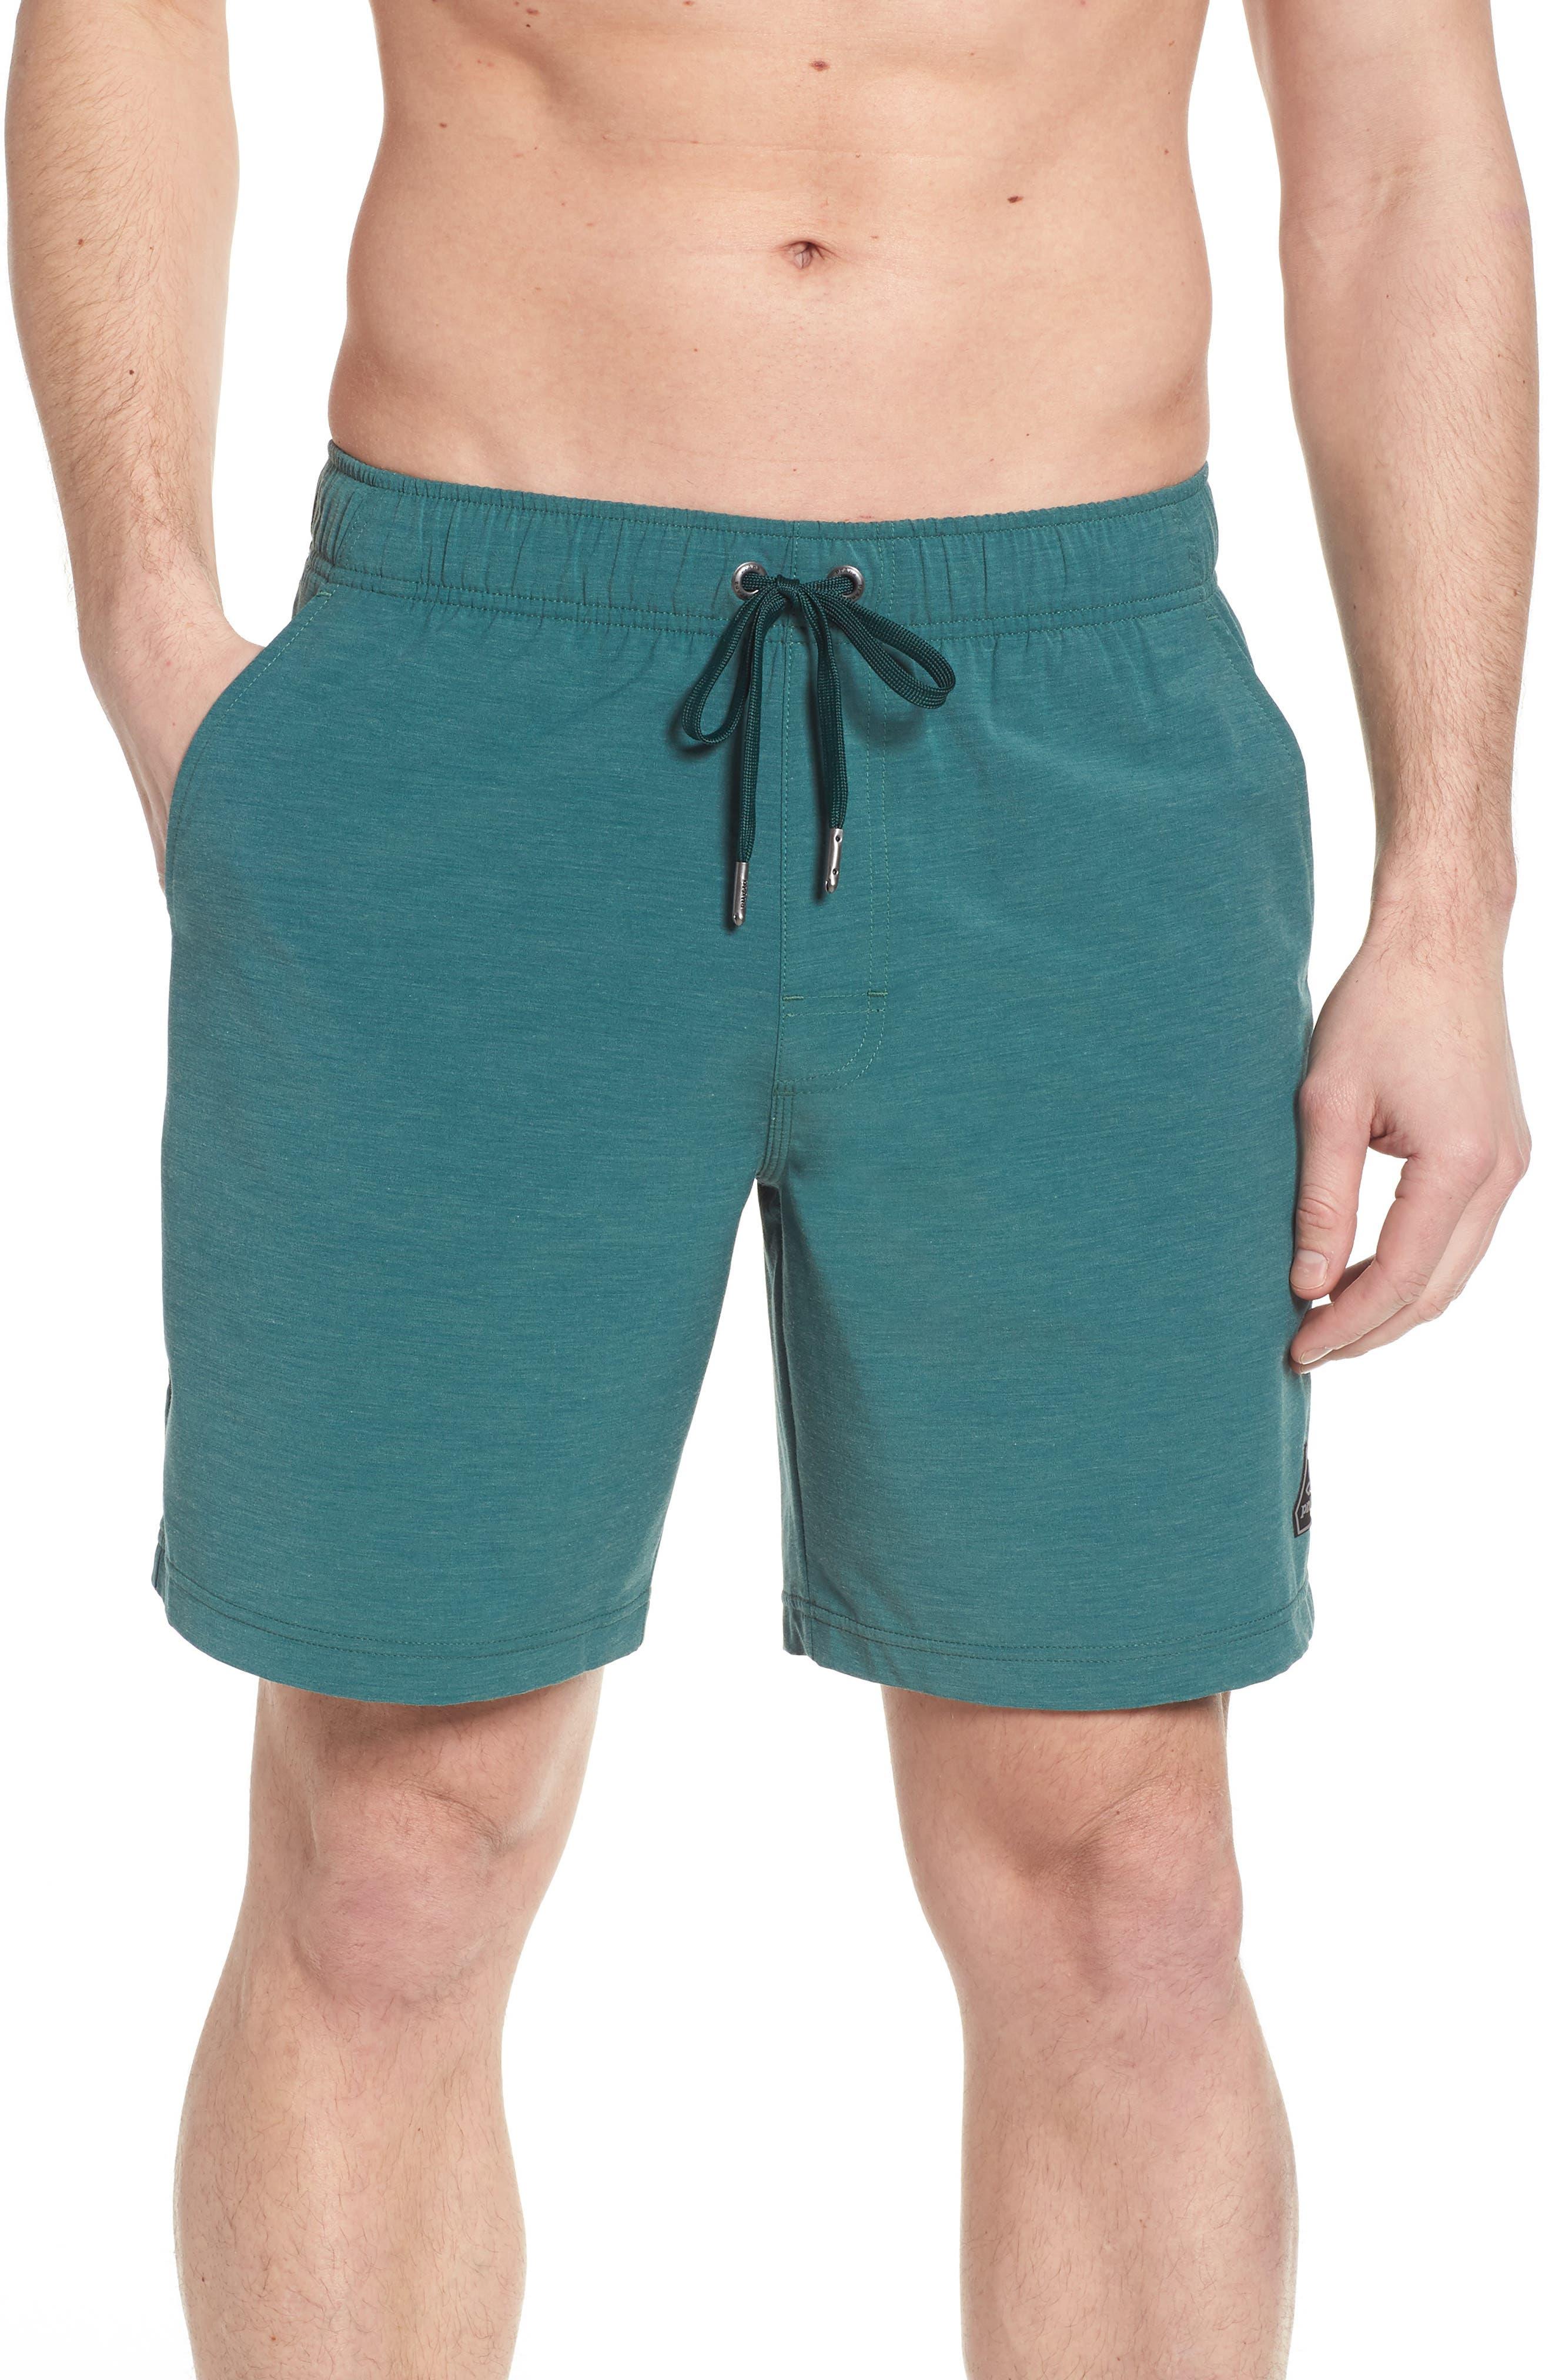 Metric Board Shorts,                         Main,                         color, 300